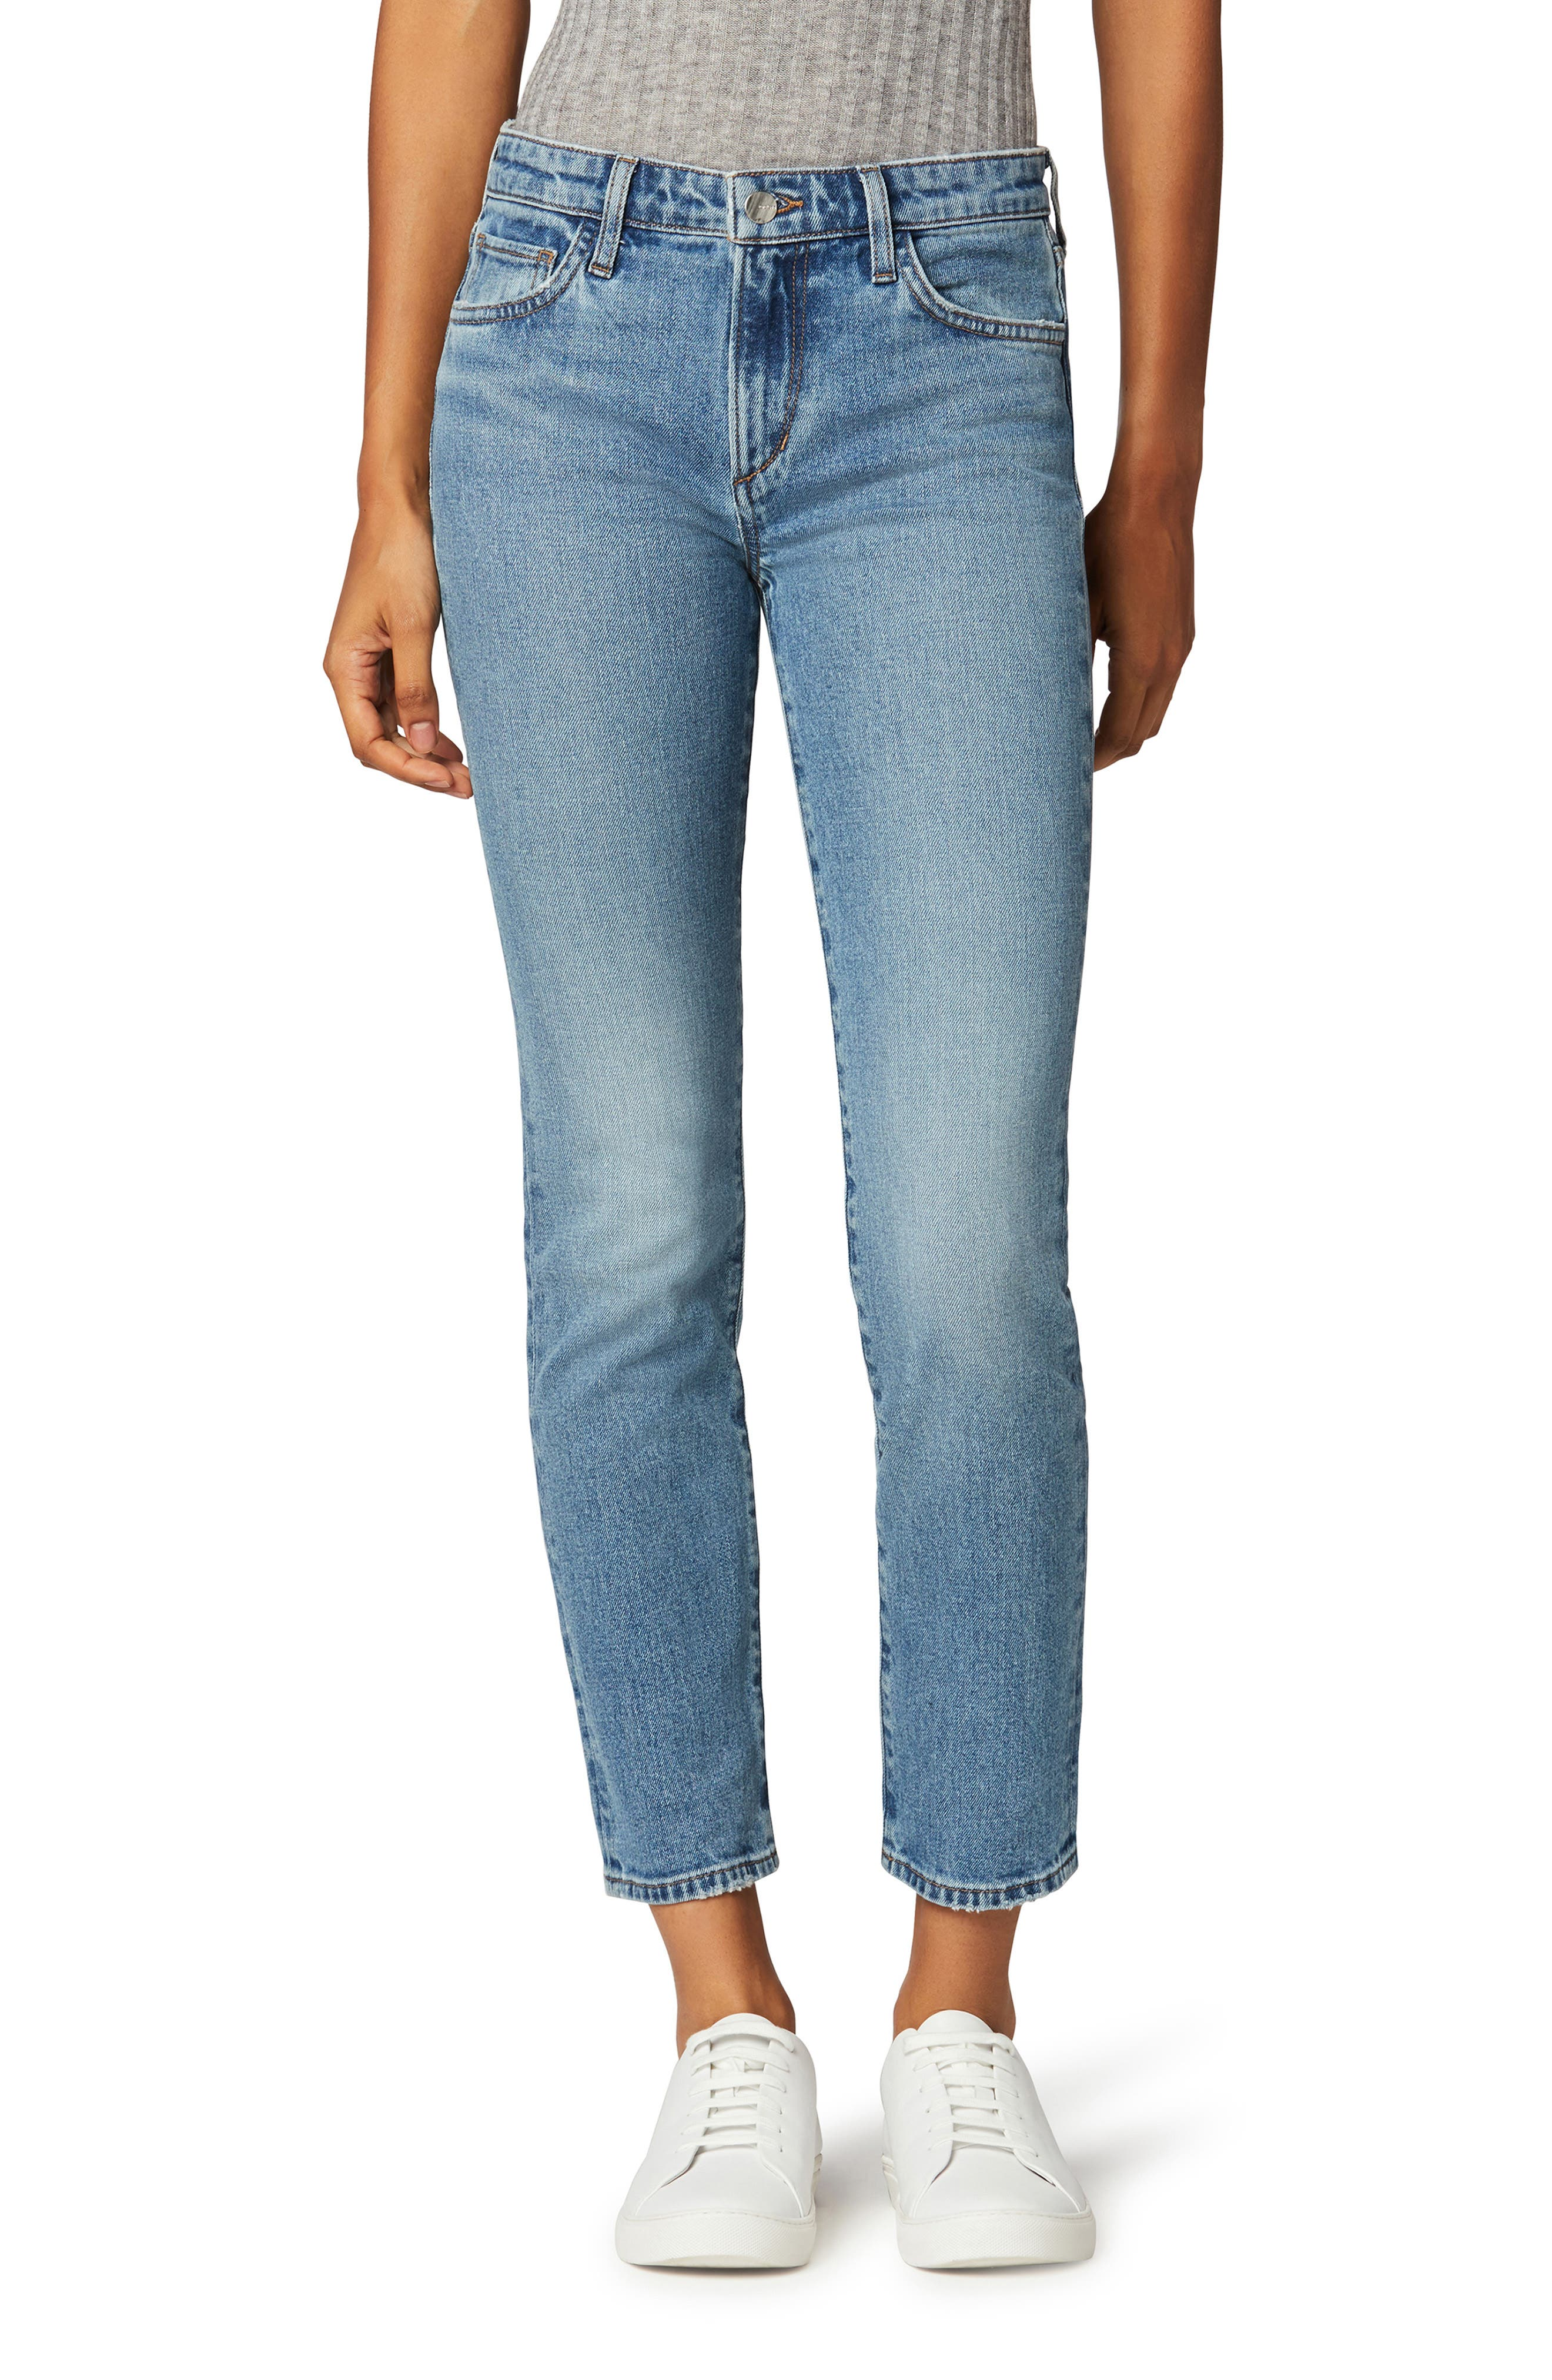 Joes Jeans Womens Jessie Top